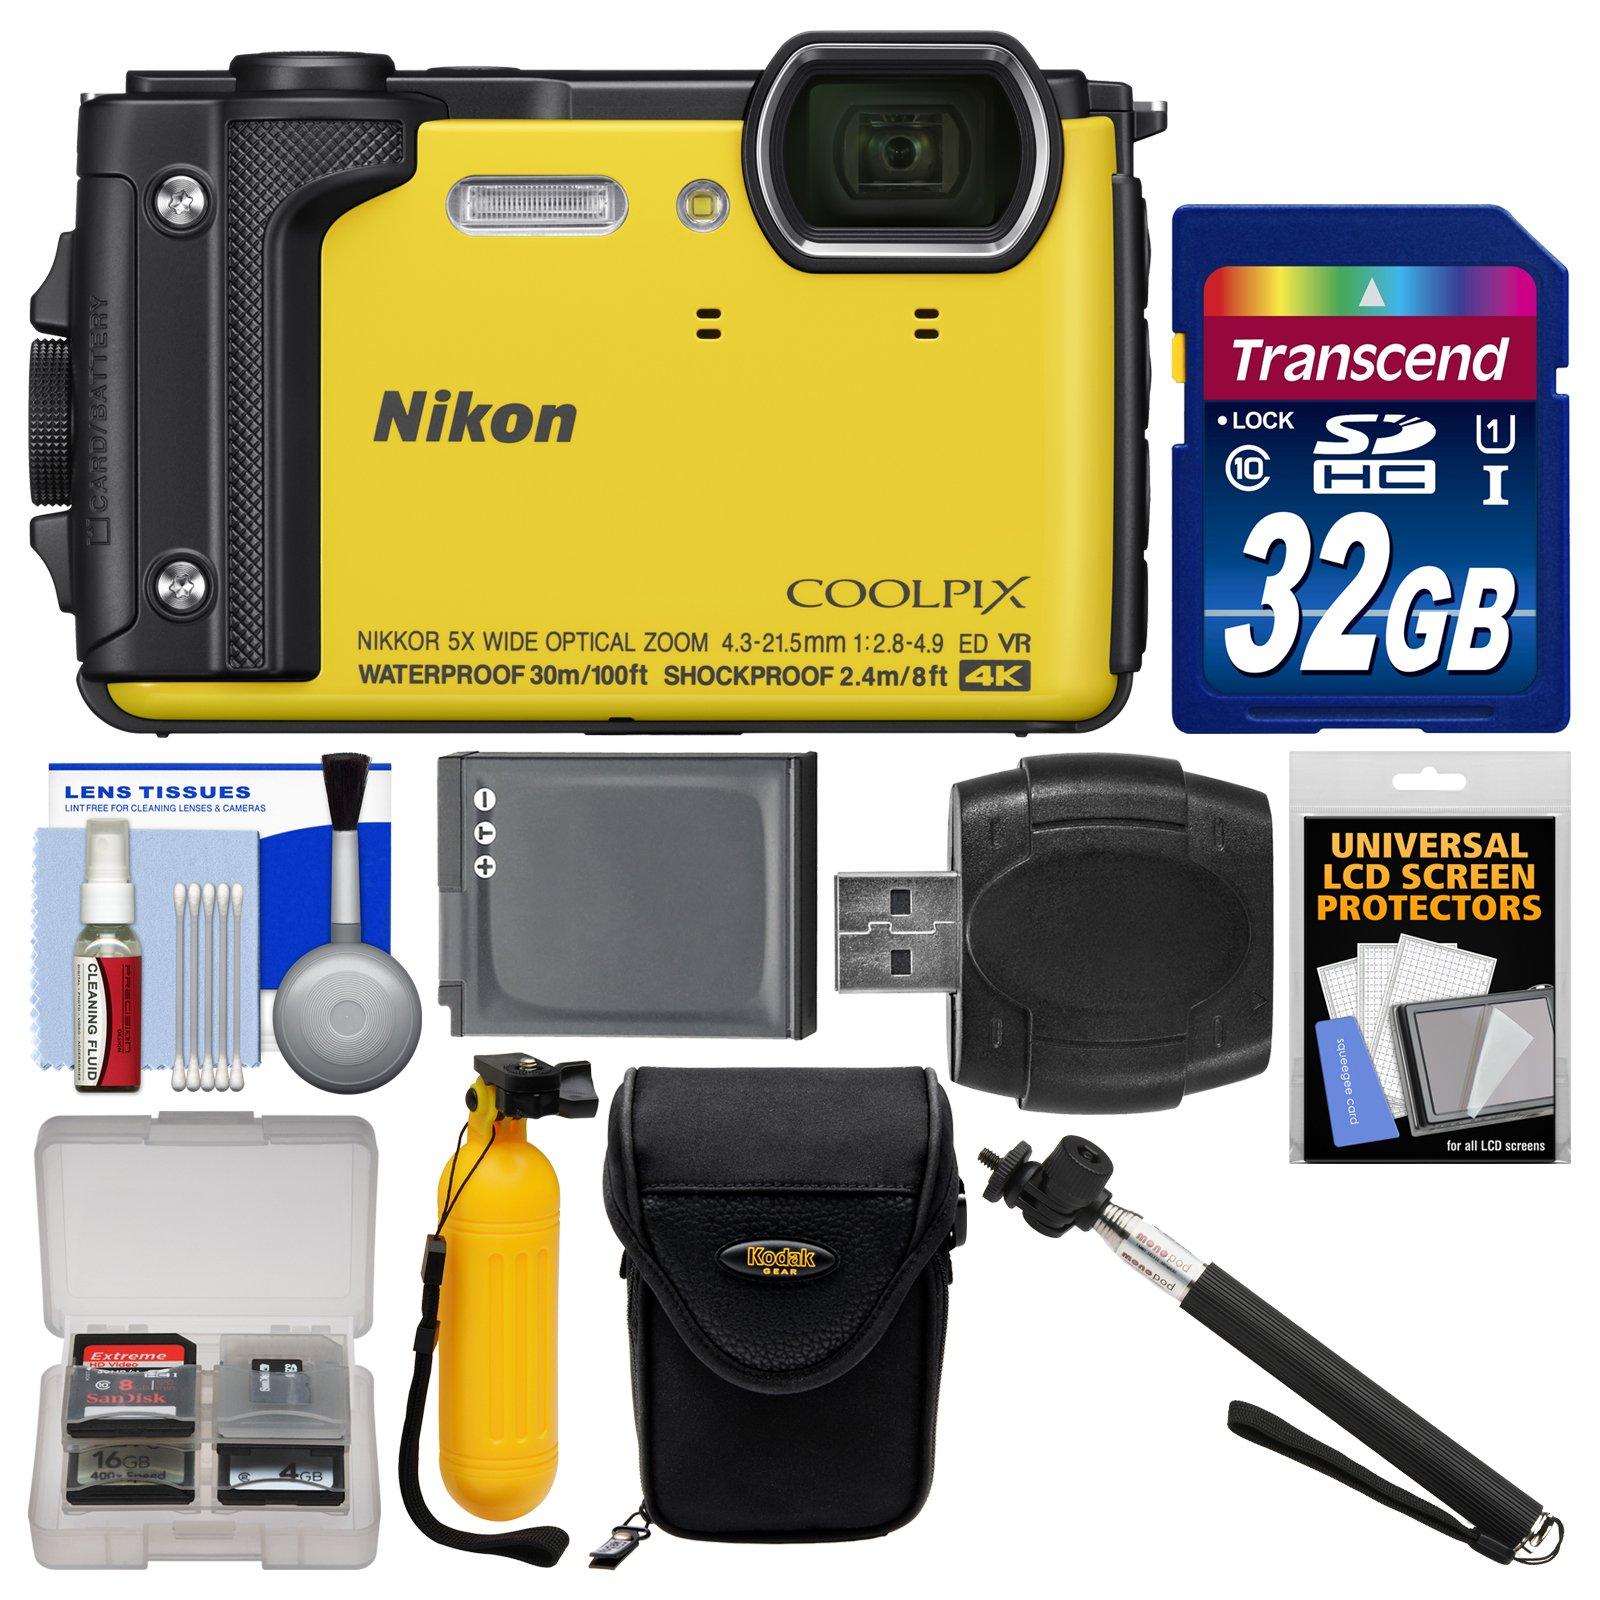 Nikon Coolpix W300 4K Wi-Fi Shock & Waterproof Digital Camera (Yellow) with 32GB Card + Case + Battery + Monopod + Floating Handle + Kit